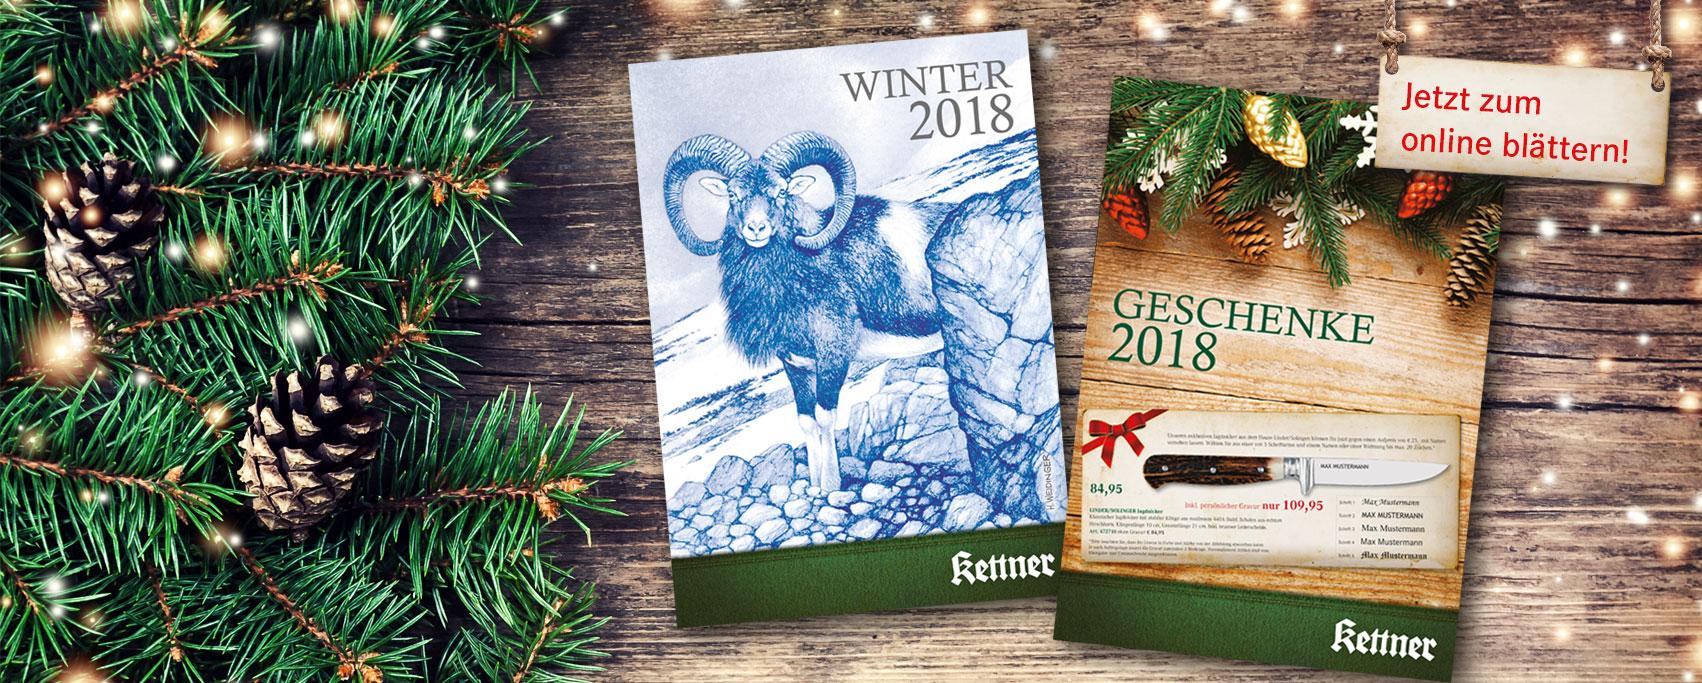 Winter- & Geschenkkatalog 2018